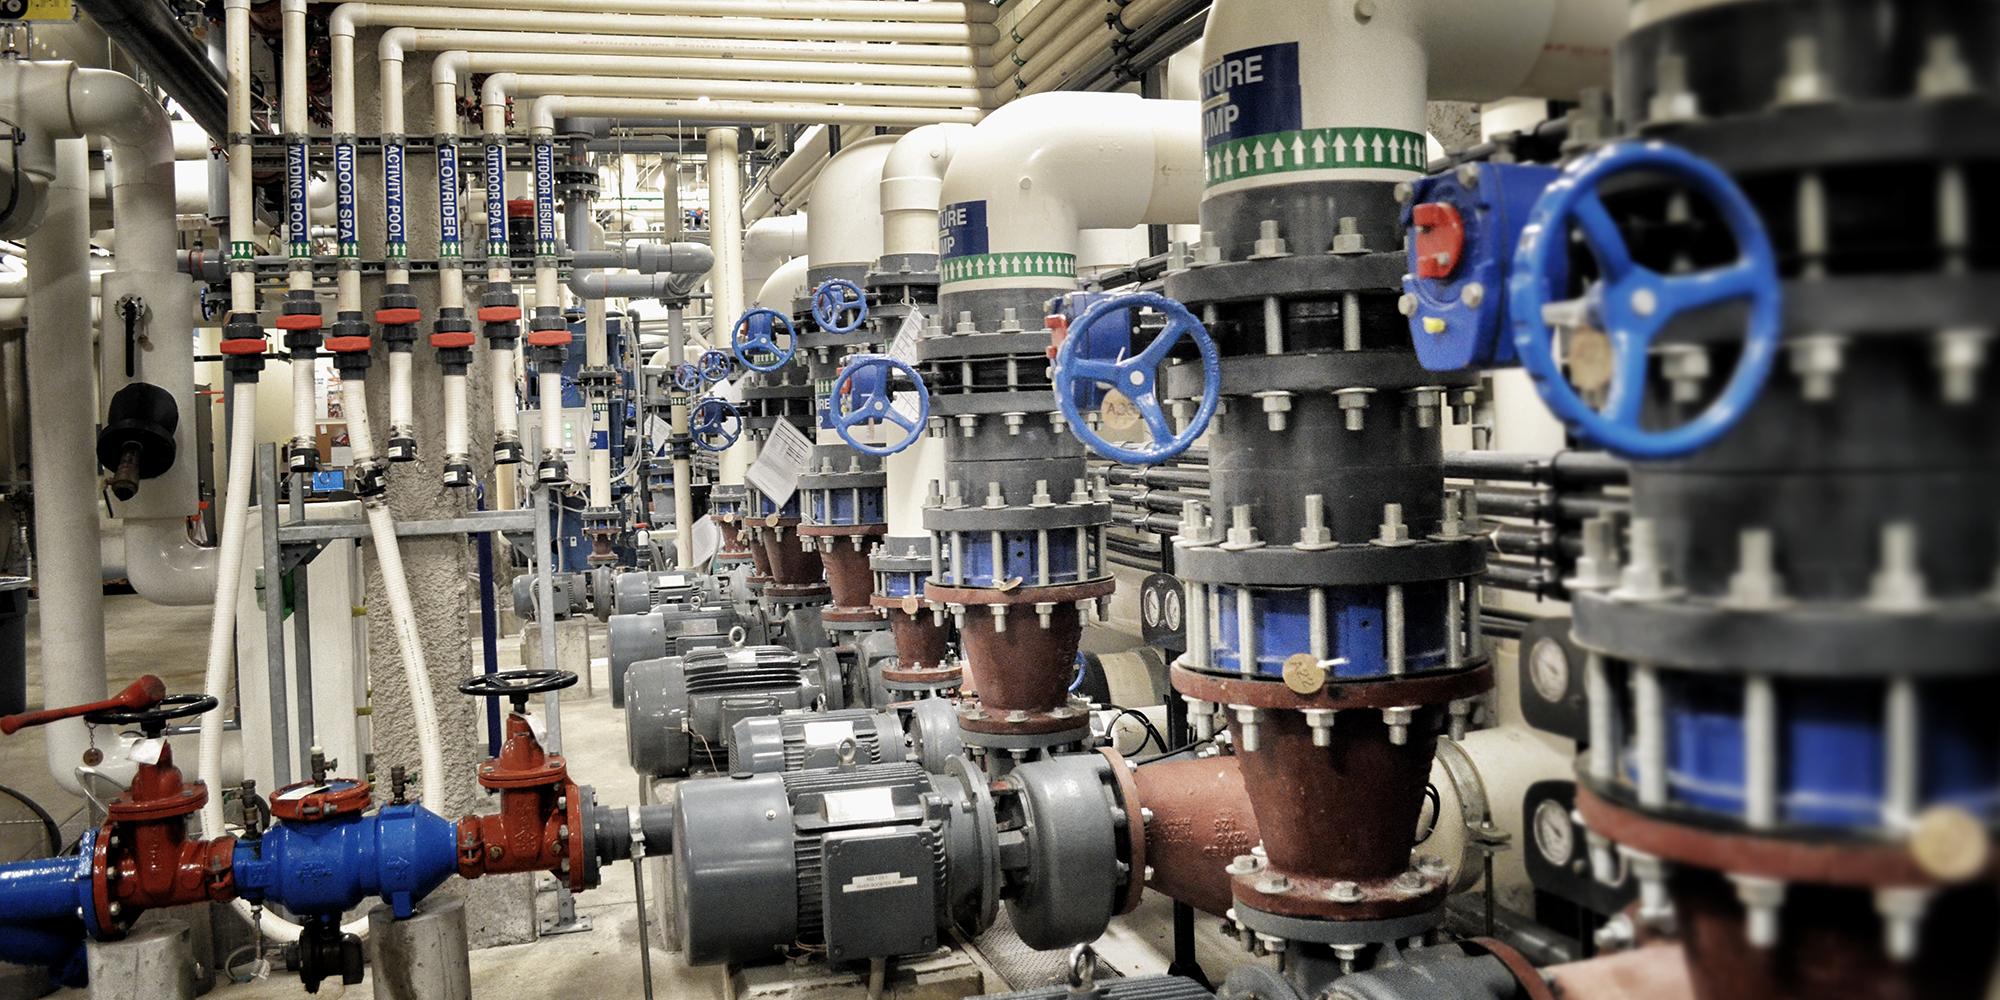 ADG Whitten Filtration Systems